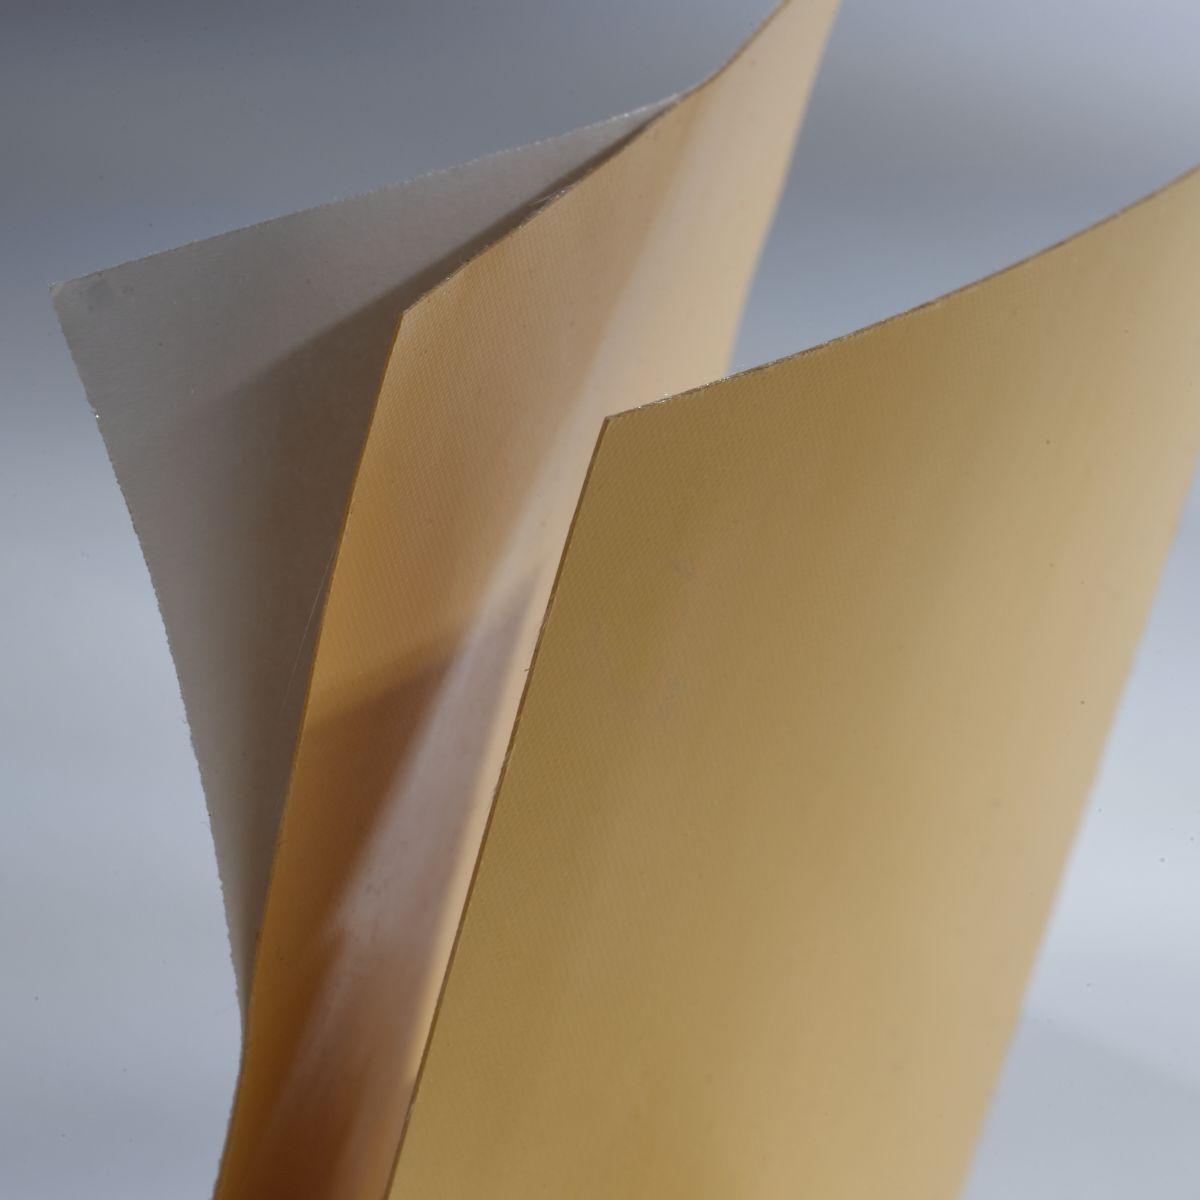 15 wmk oranje warmtegeleidende silicone folie